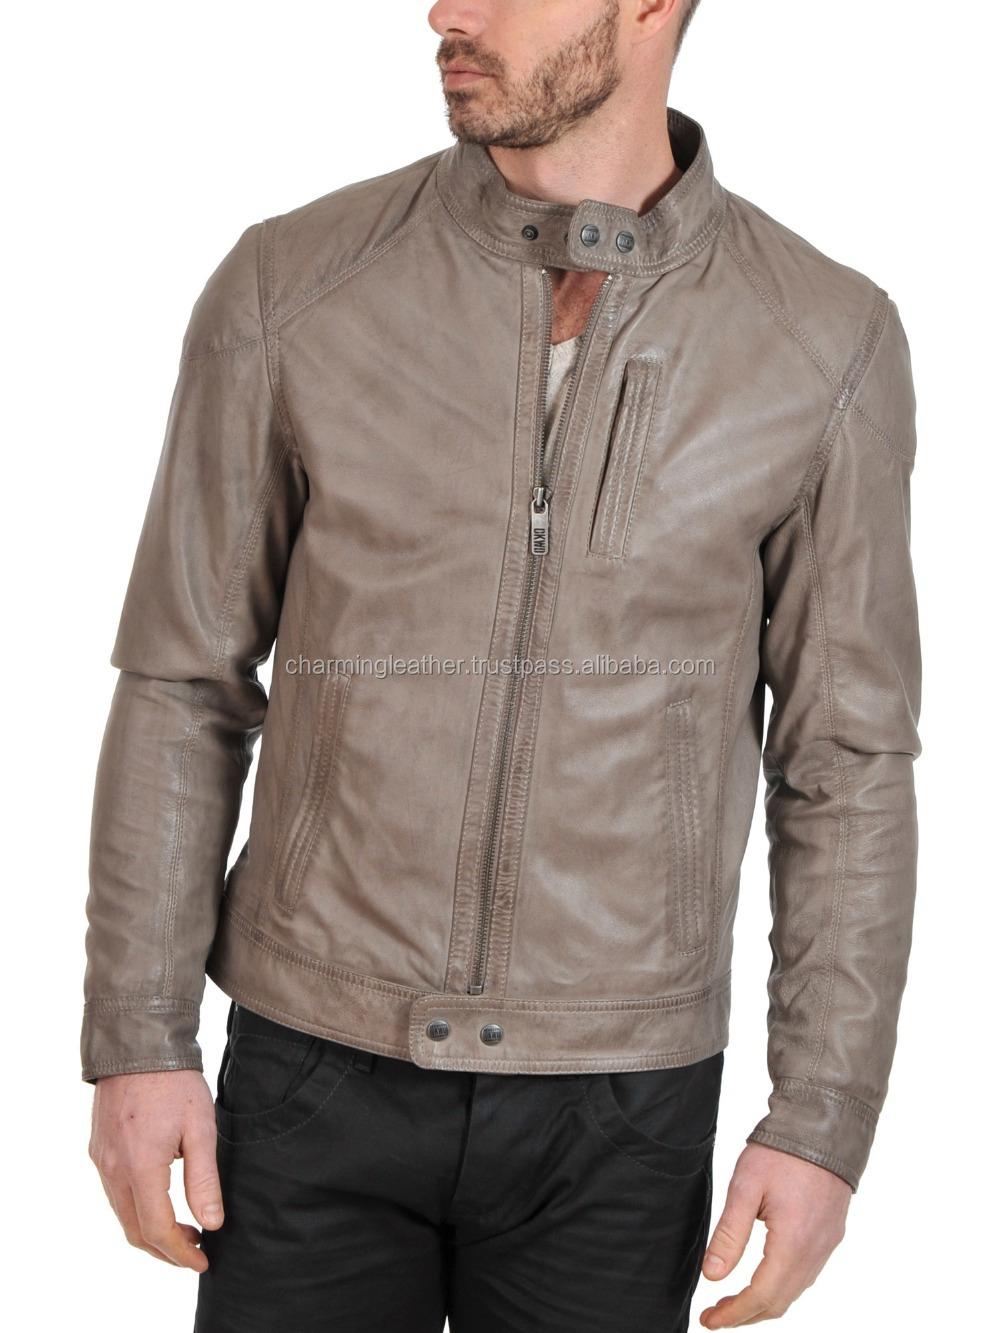 Stylish Collar Short Leather Jacket Mens 2015 New Style Leather